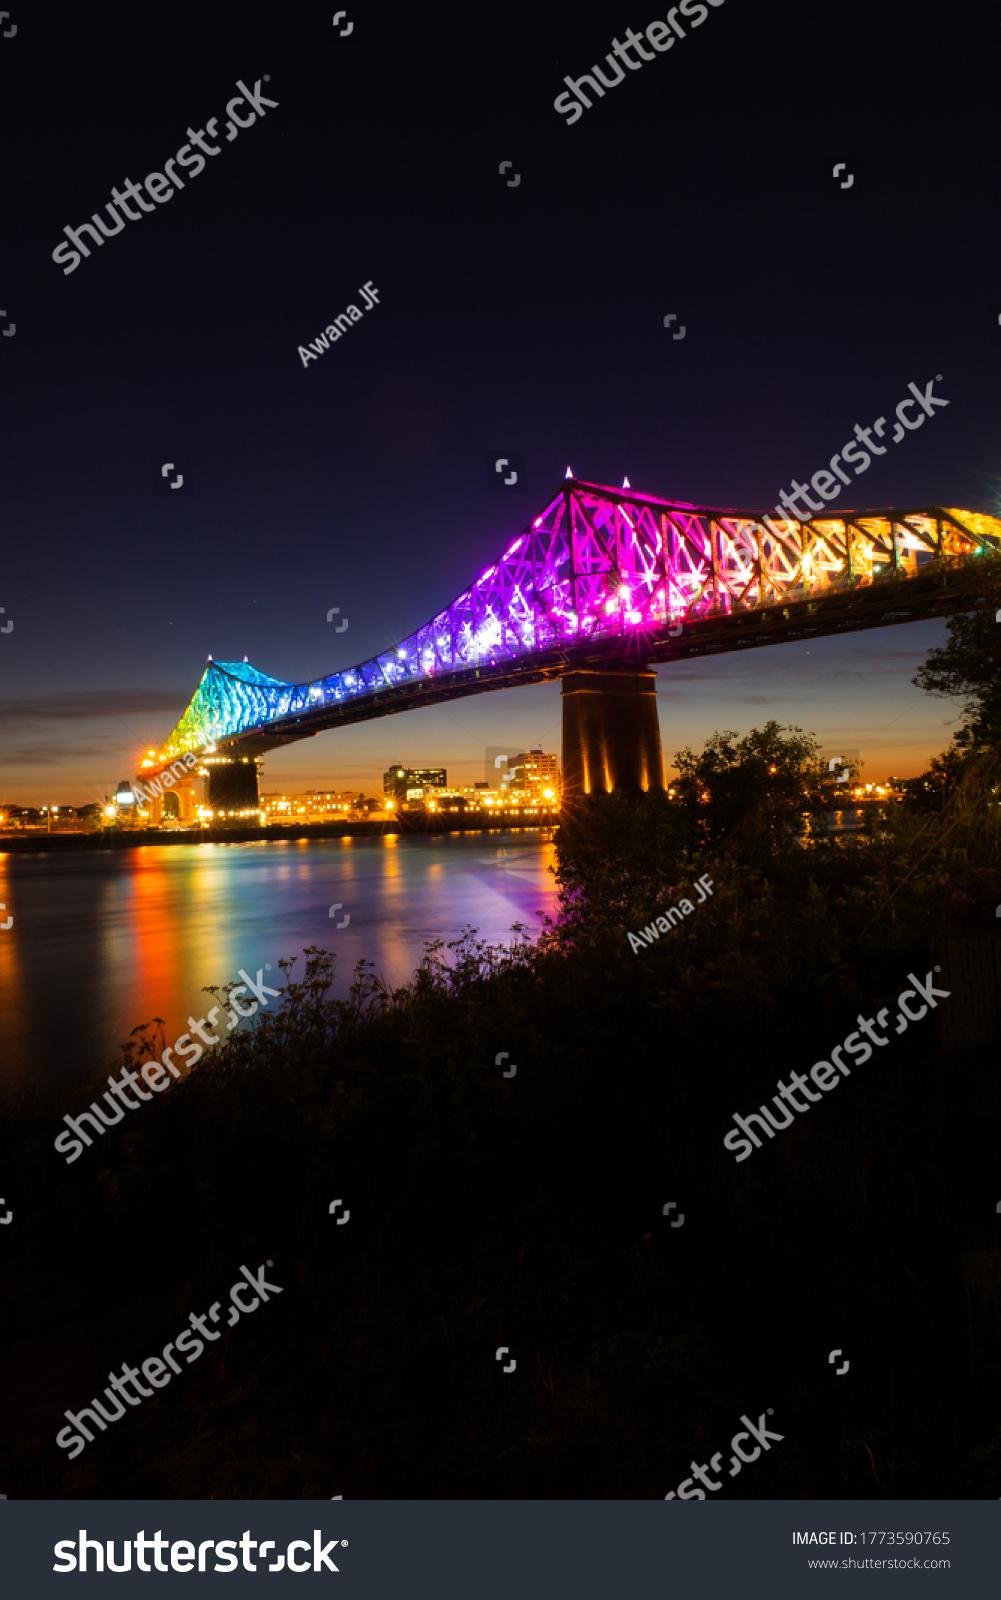 stock-photo-montreal-canada-june-night-v